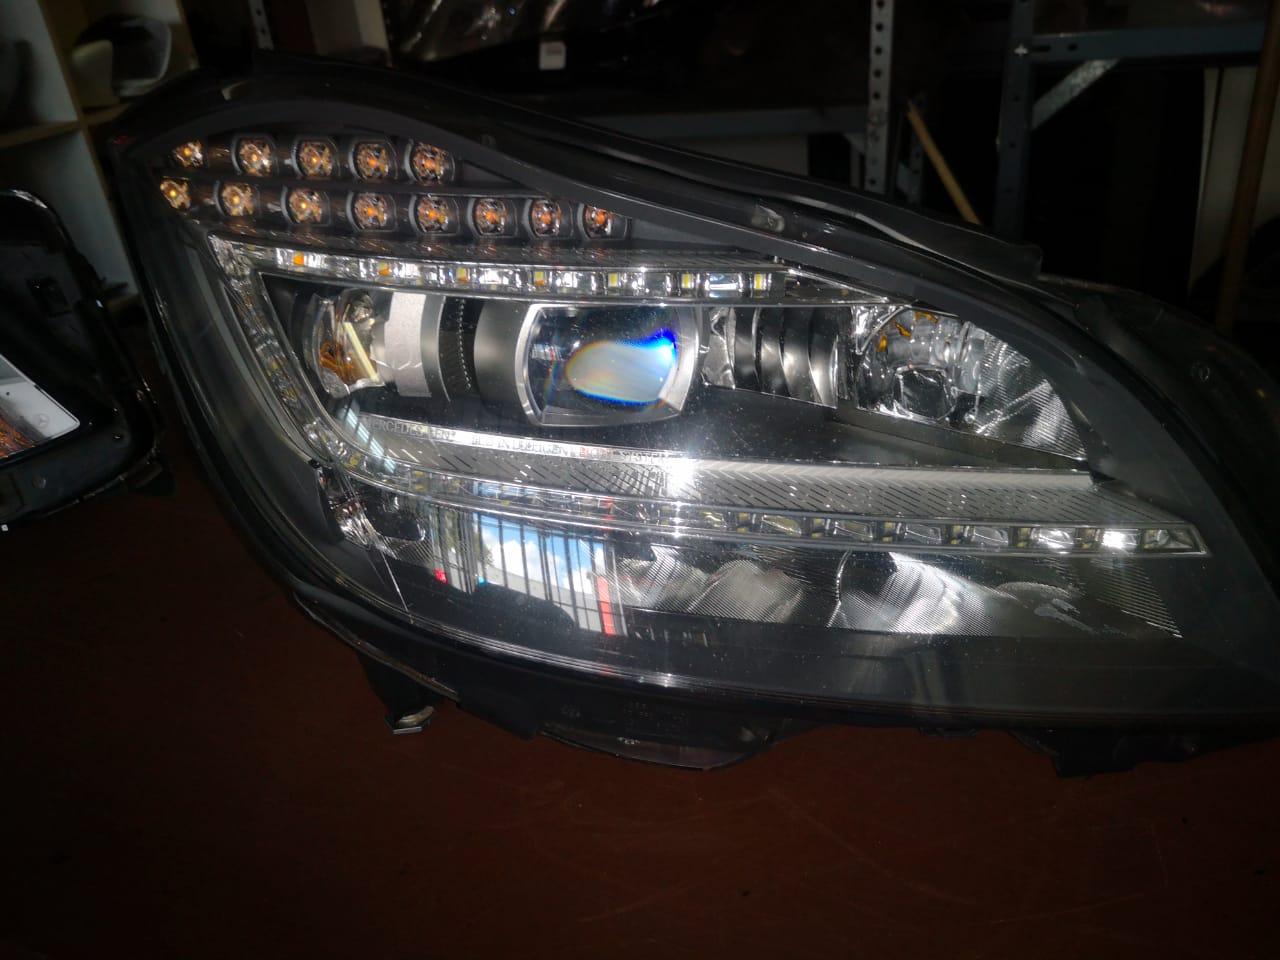 mercede benz w218 cls heasdlamp  for sale